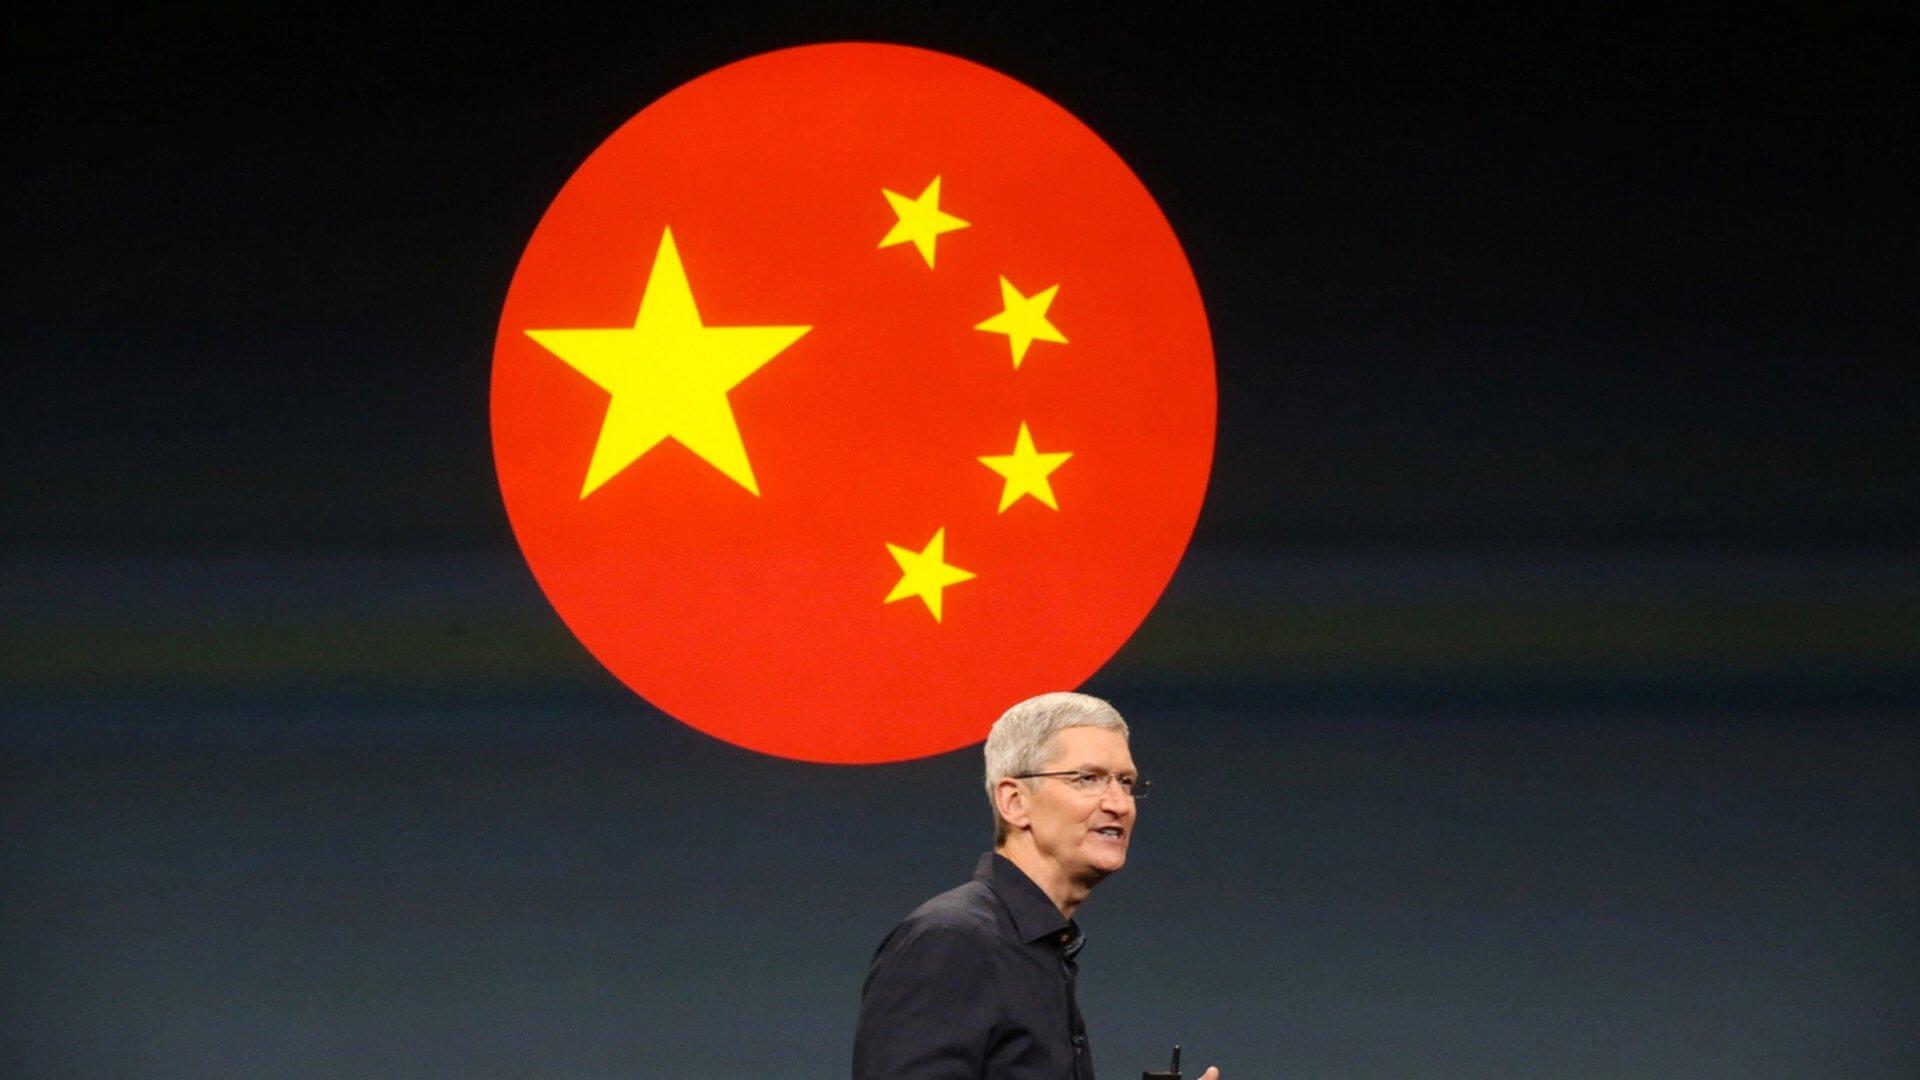 А будет ли вообще iPhone 9?